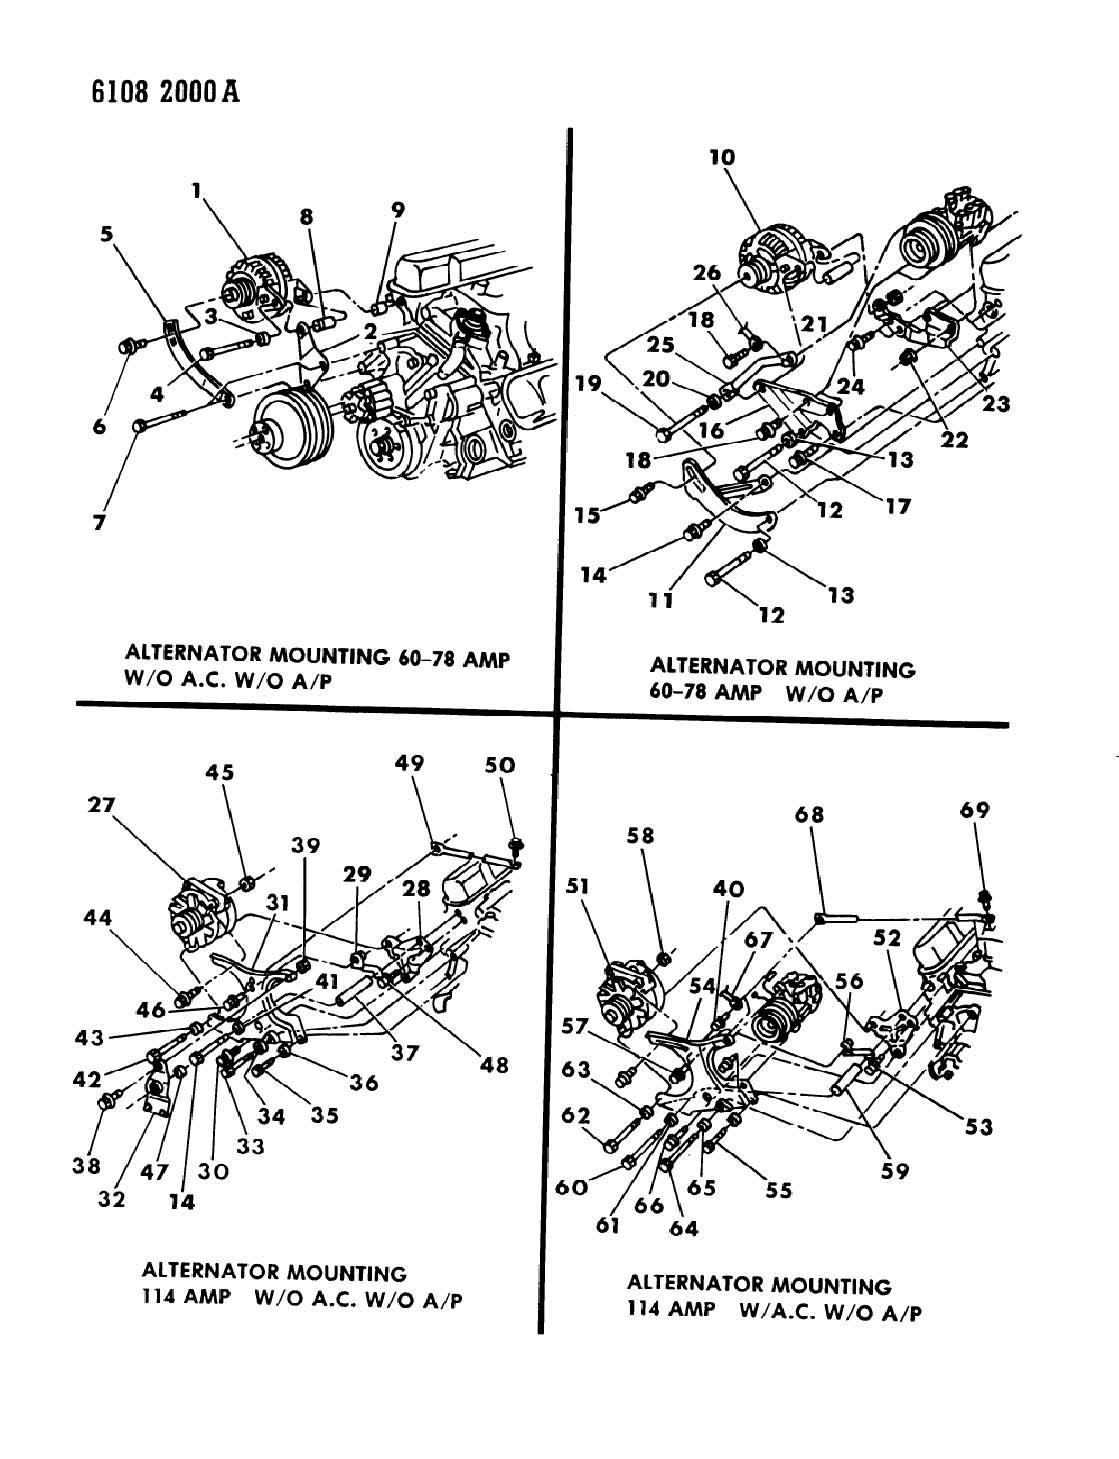 mopar 318 engine Schaltplang